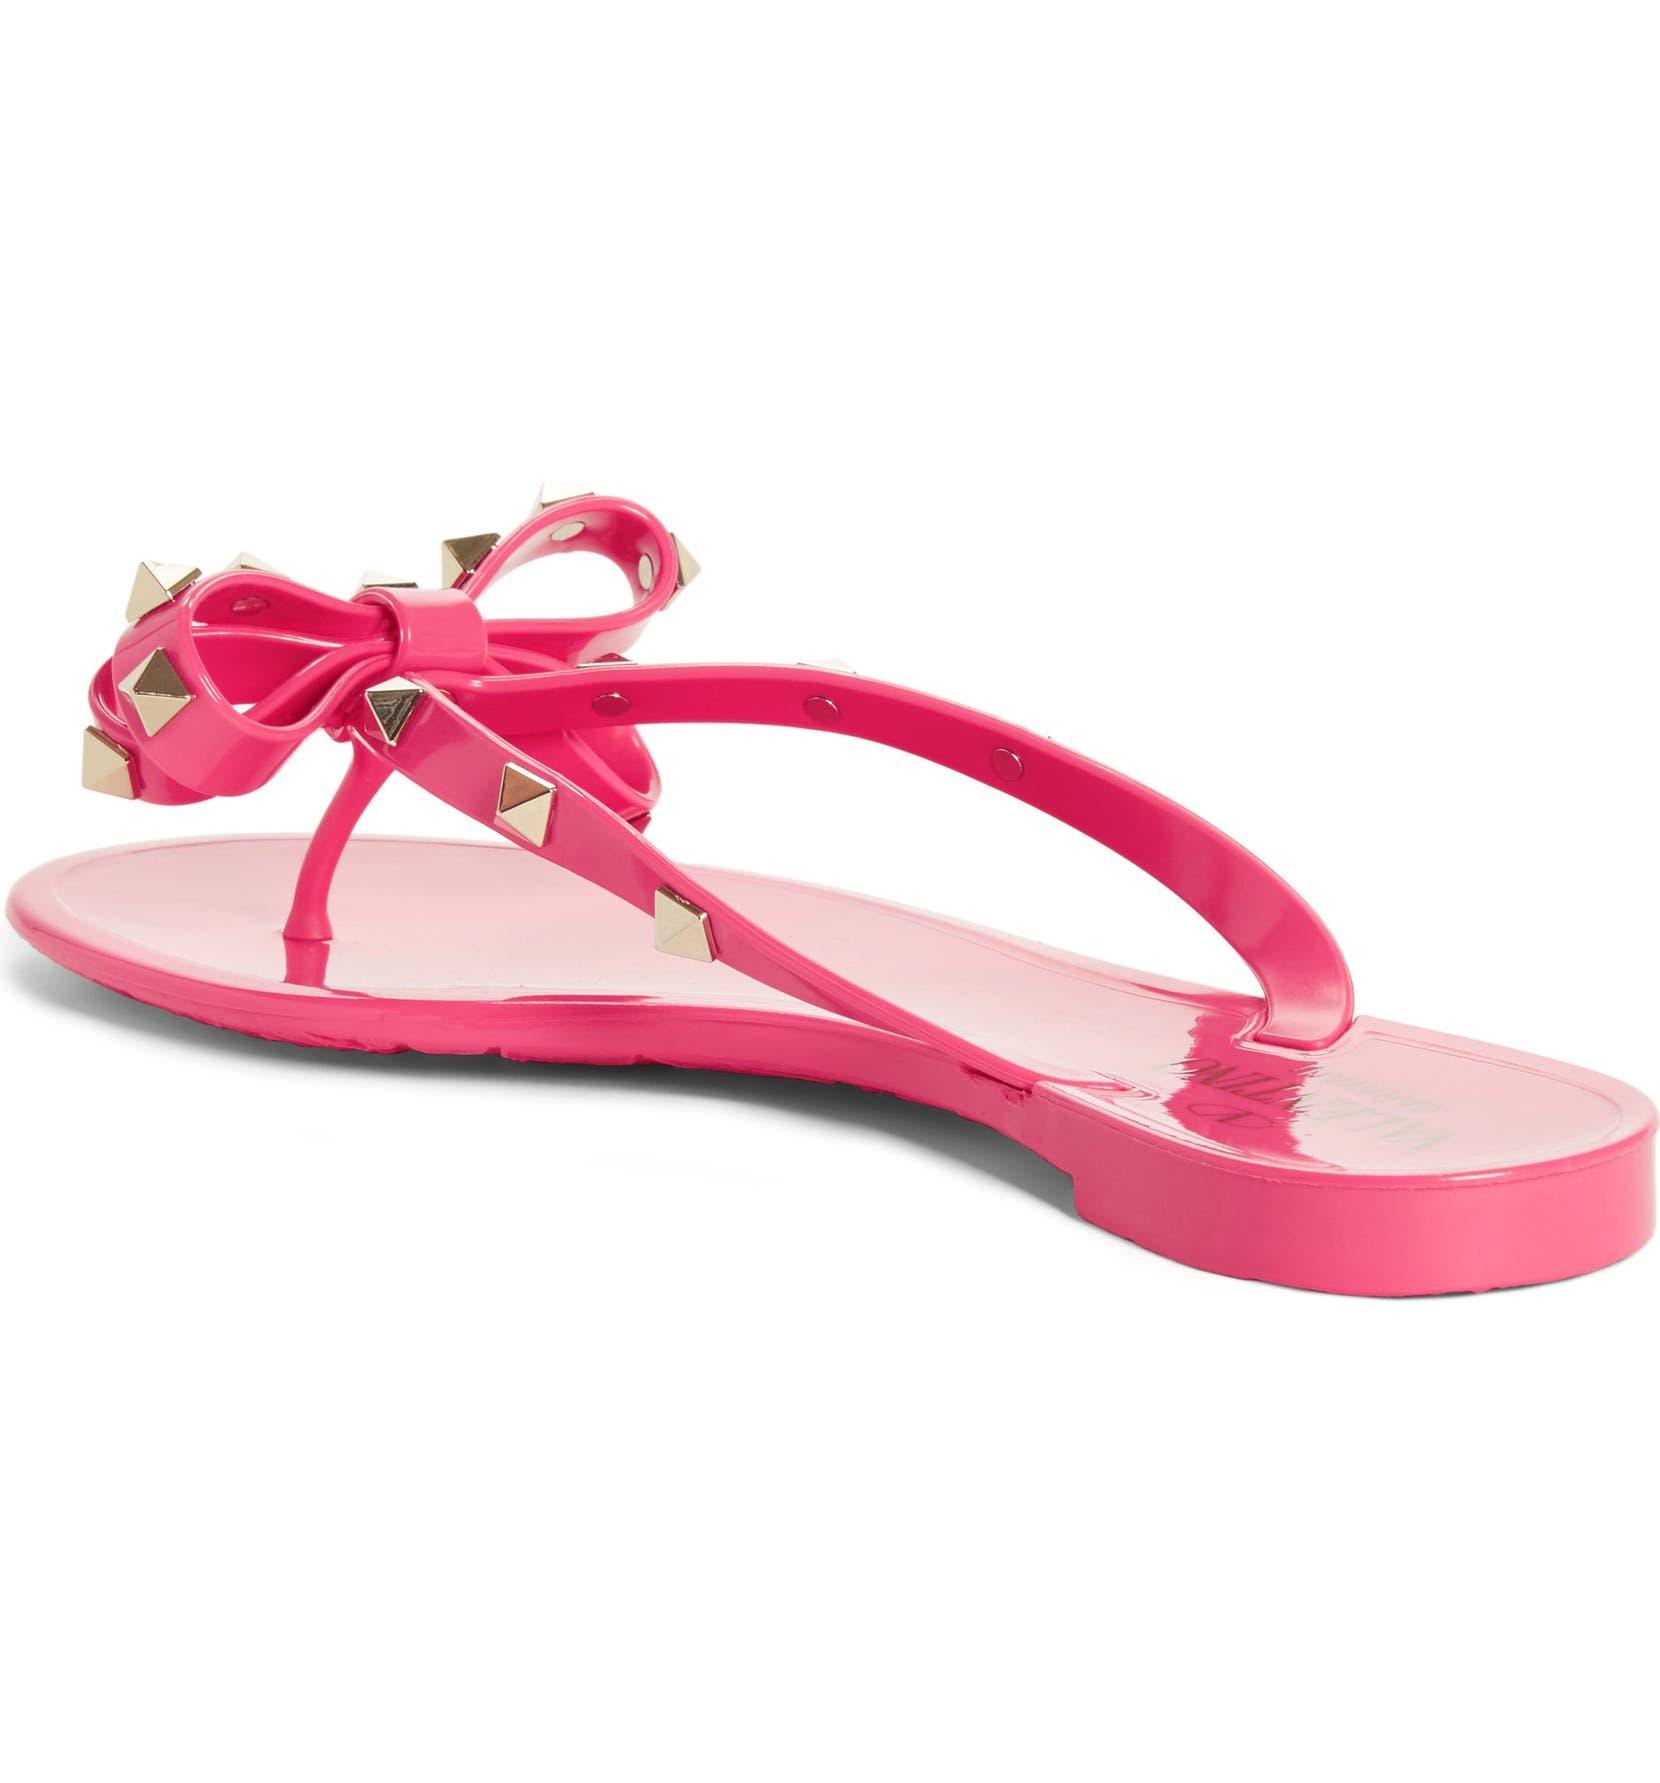 Valentino Garavani Rockstud Flip Flop Women Nordstrom Flops And Not The Sandy Beach Kind Design Technology